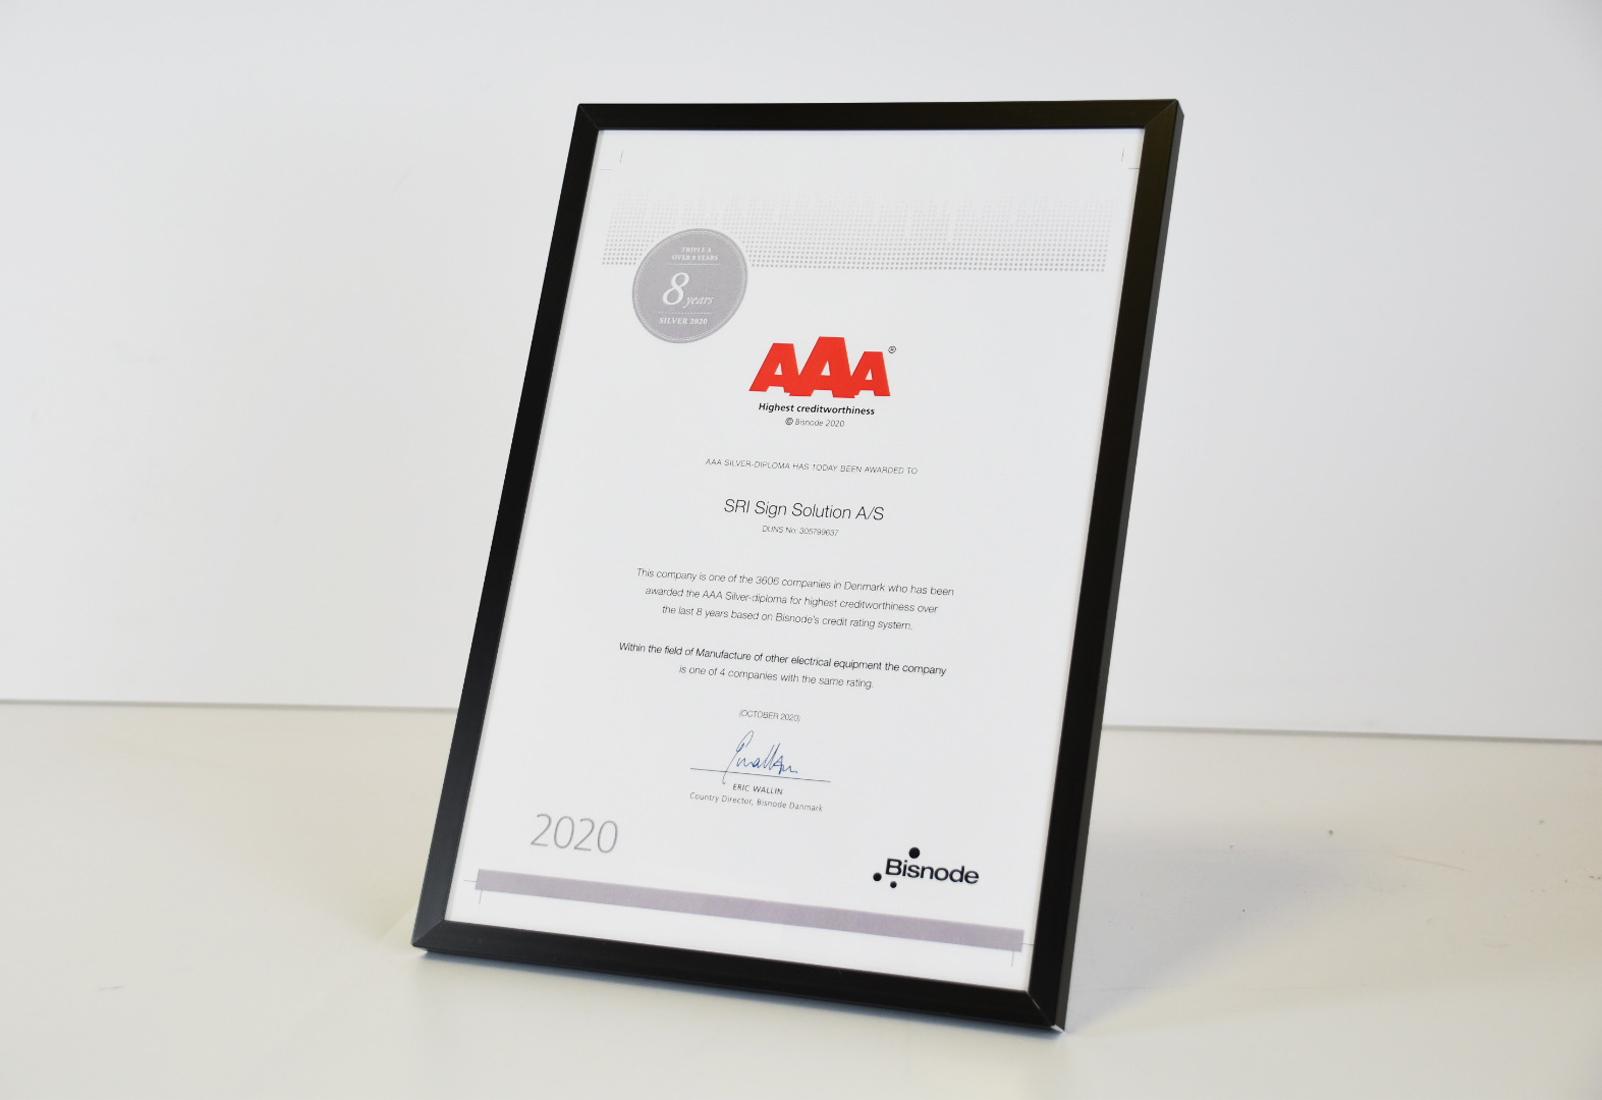 AAA diplom - nu 8 år - SRI Sign Solution A/S